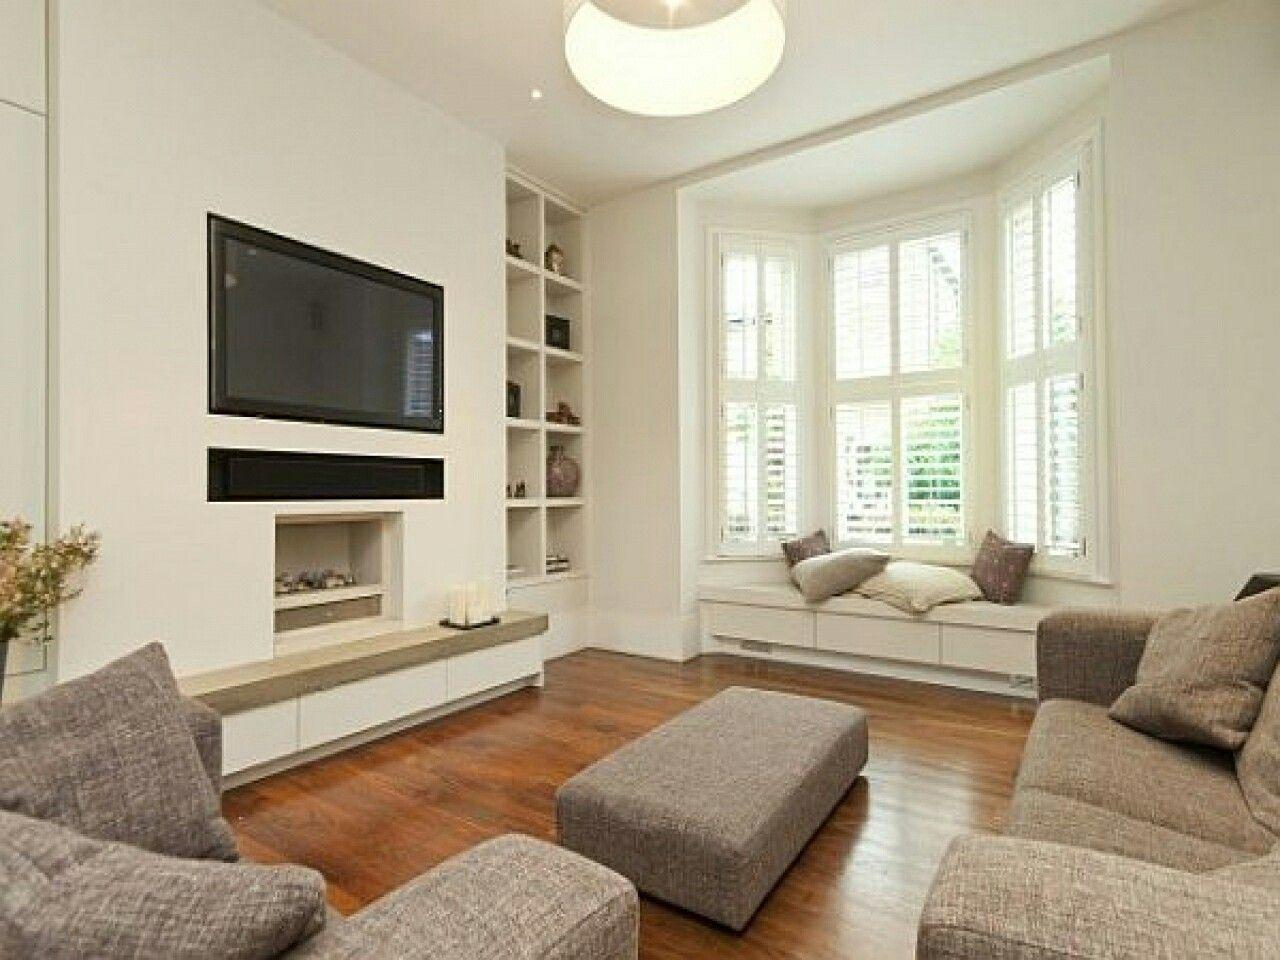 Lounge ideas | Bay window living room, Livingroom layout ...